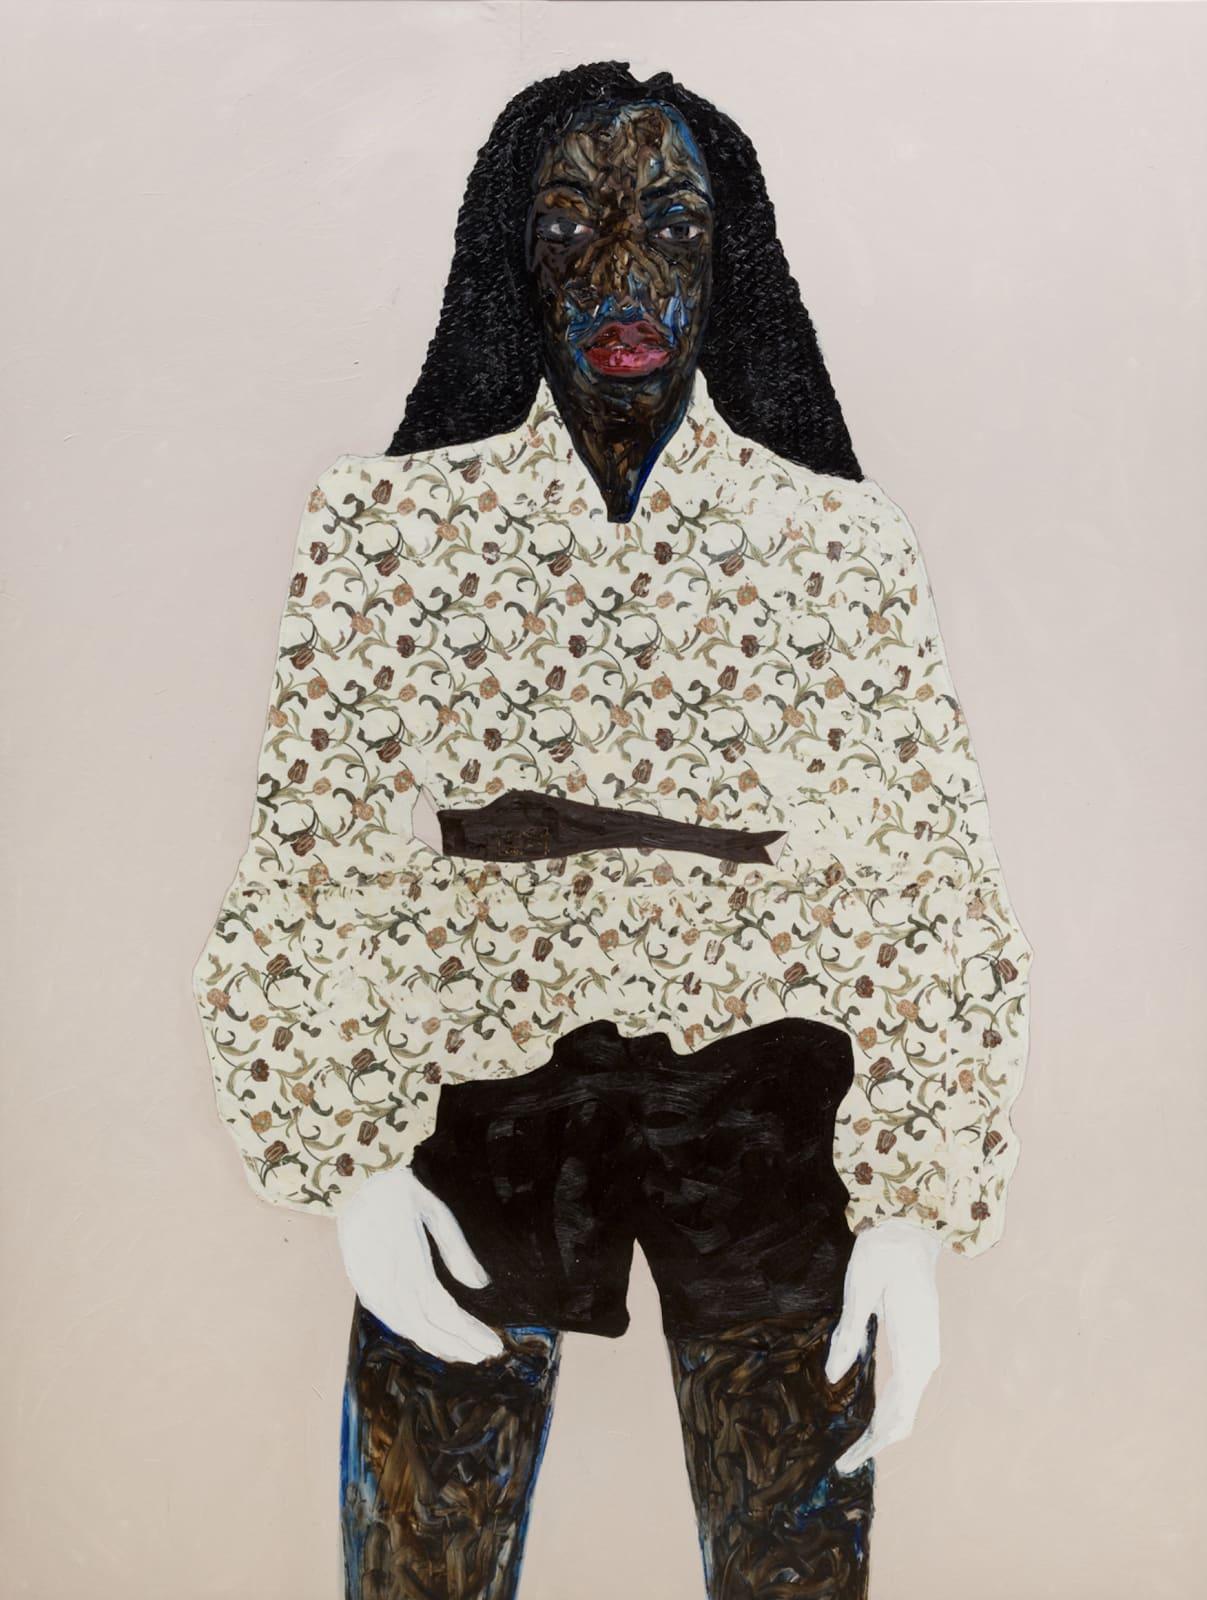 Amoako Boafo, Umber Brown Belt, 2020